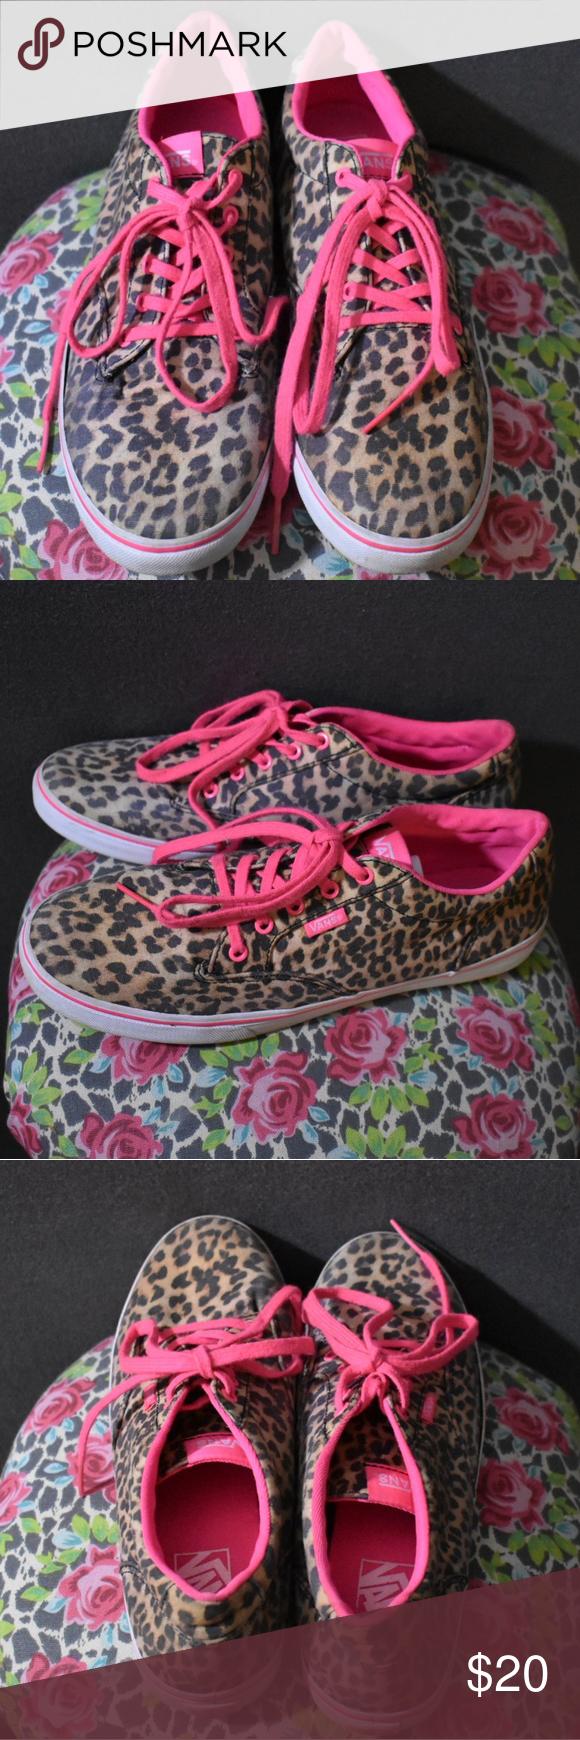 06650e79b8 🐆Vans Leopard Print   Hot Pink Good Used Condition Preloved Vans Shoes